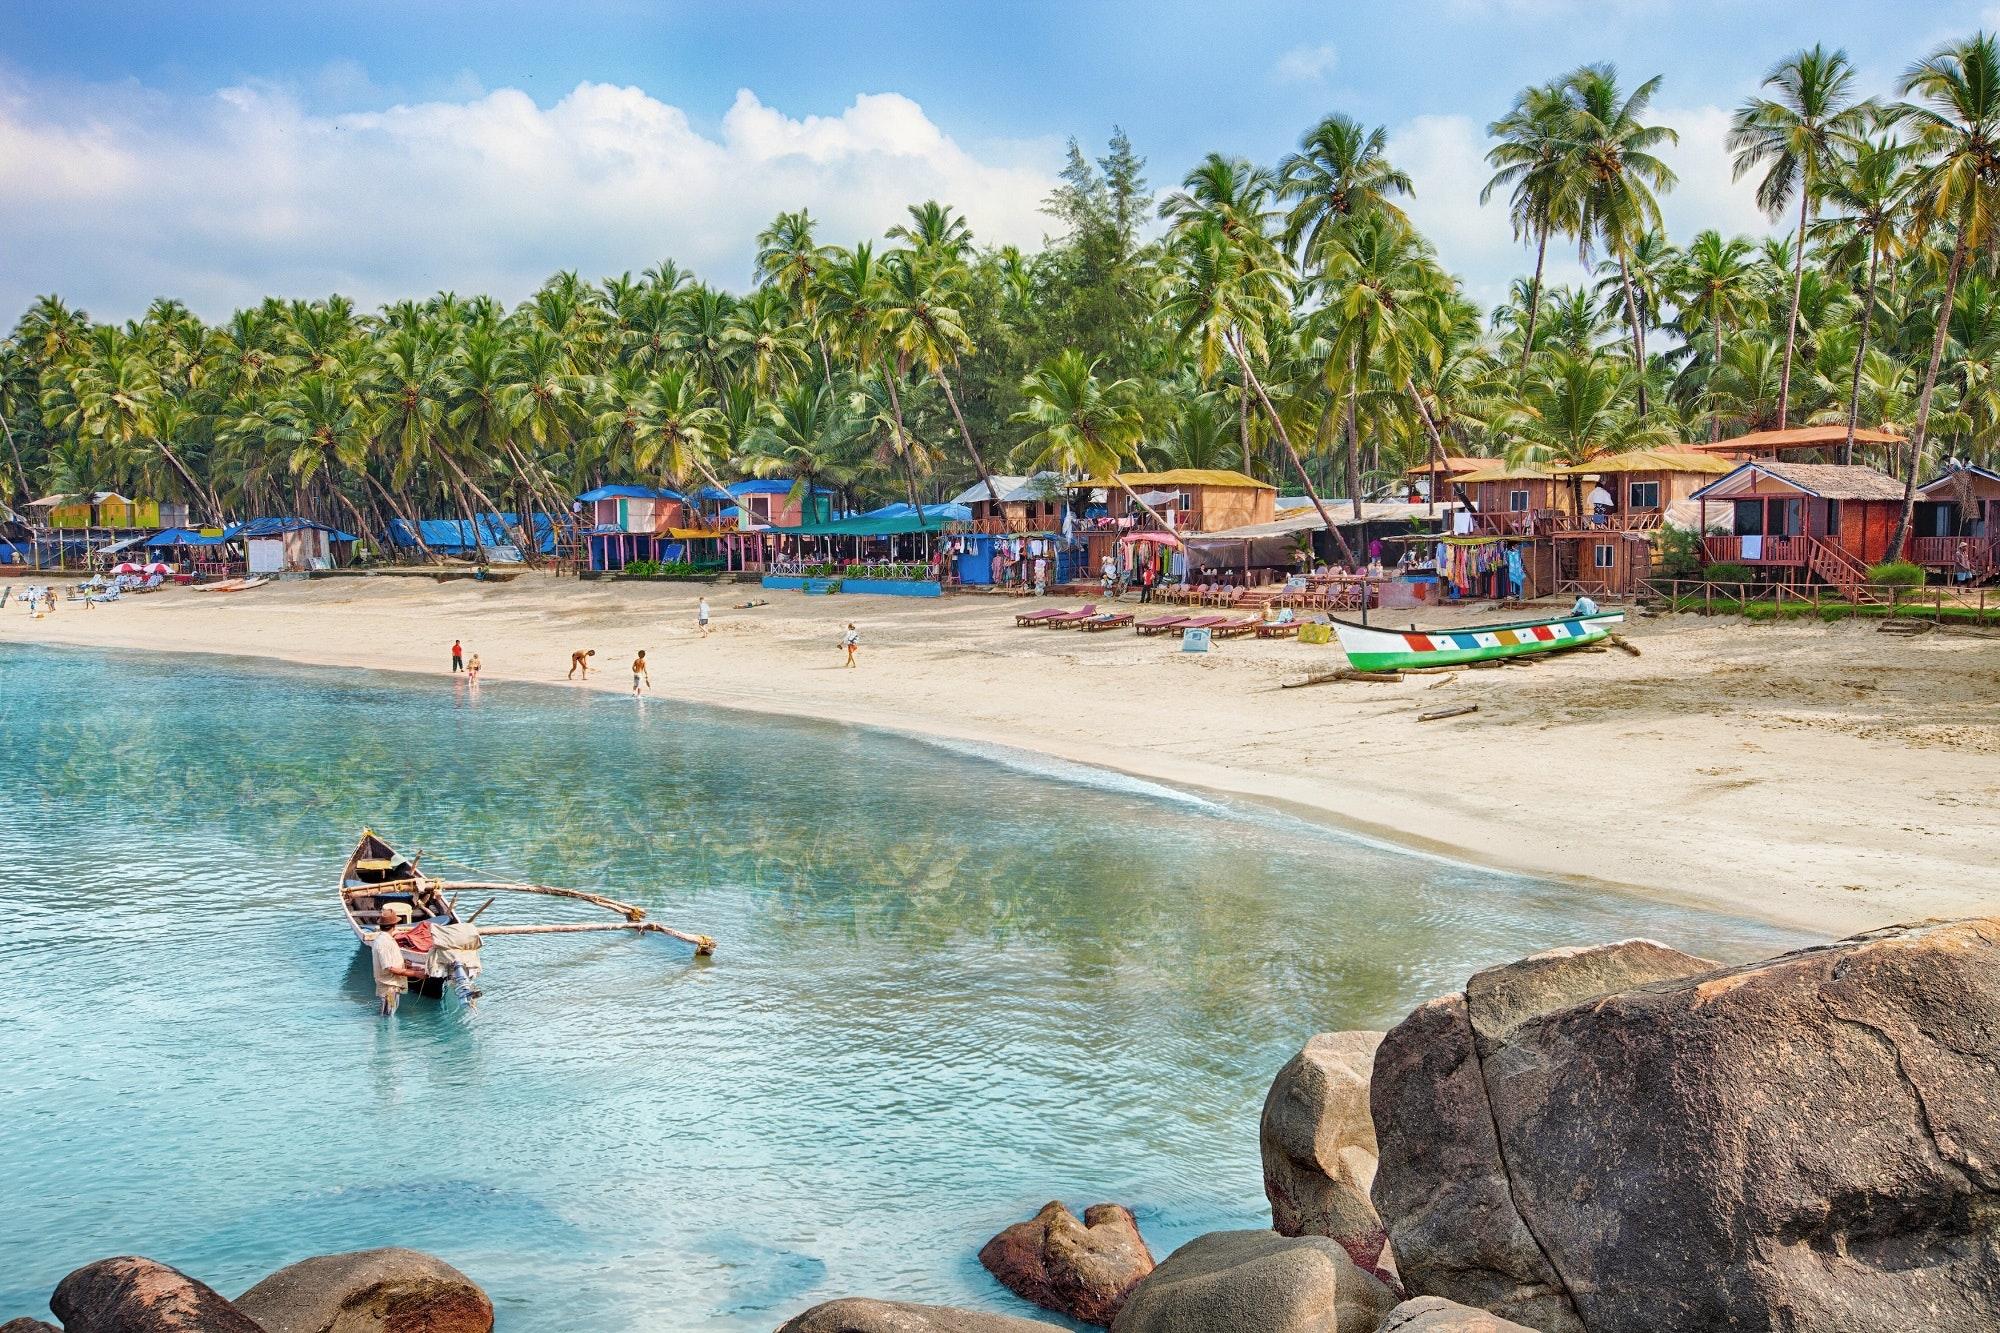 Palm-lined Palolem Beach in southern Goa © Lena Serditova / Shutterstock